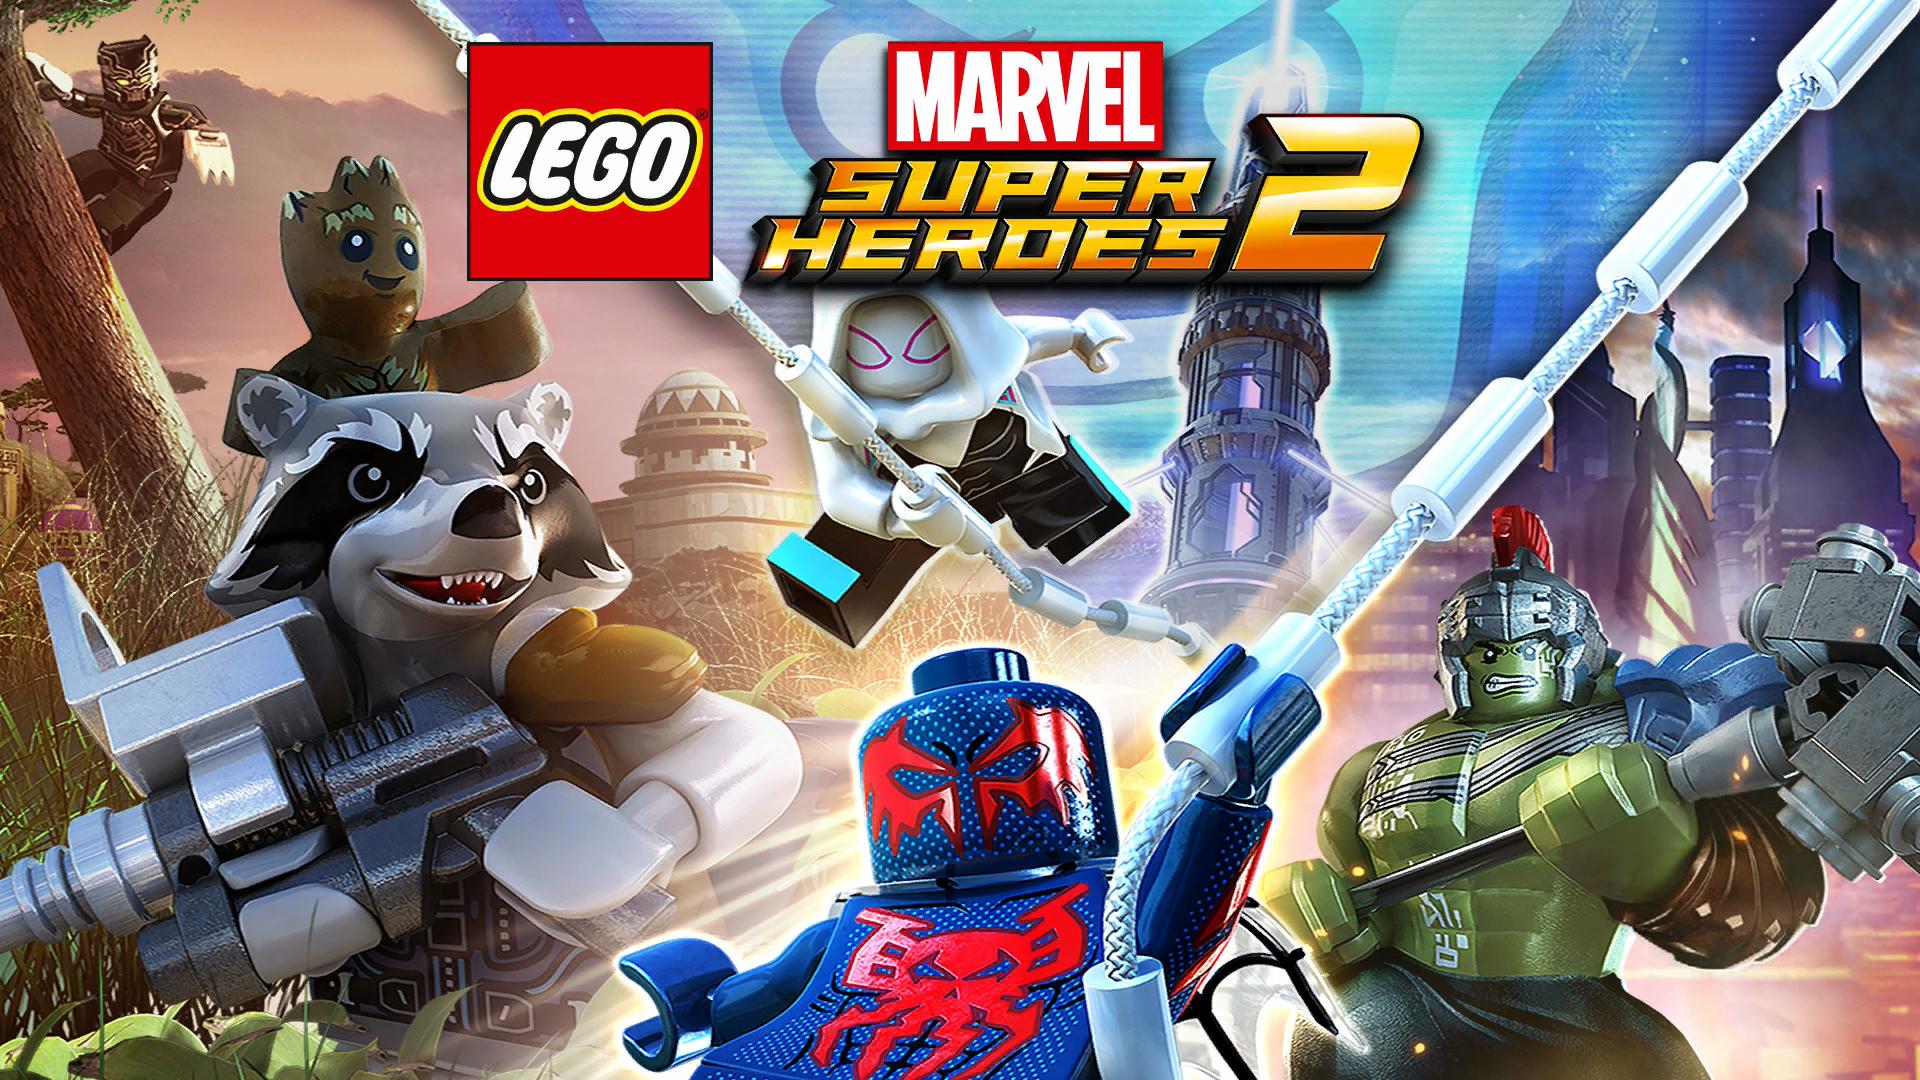 Lego marvel super heroes 2 the kotaku review kotaku - Logo super heros ...